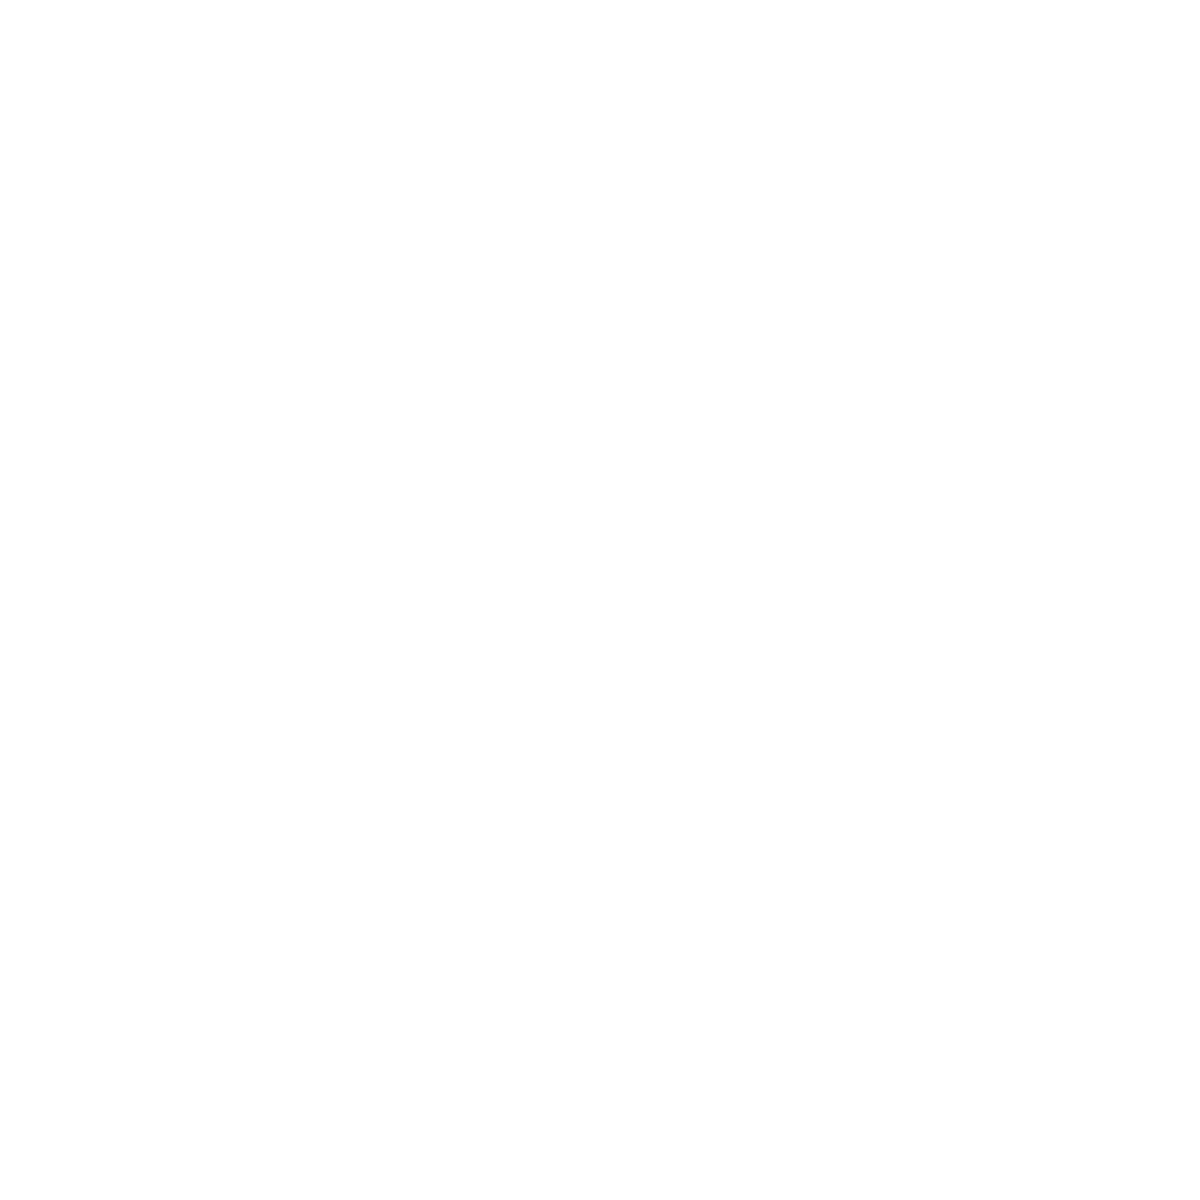 ico_E-commerce